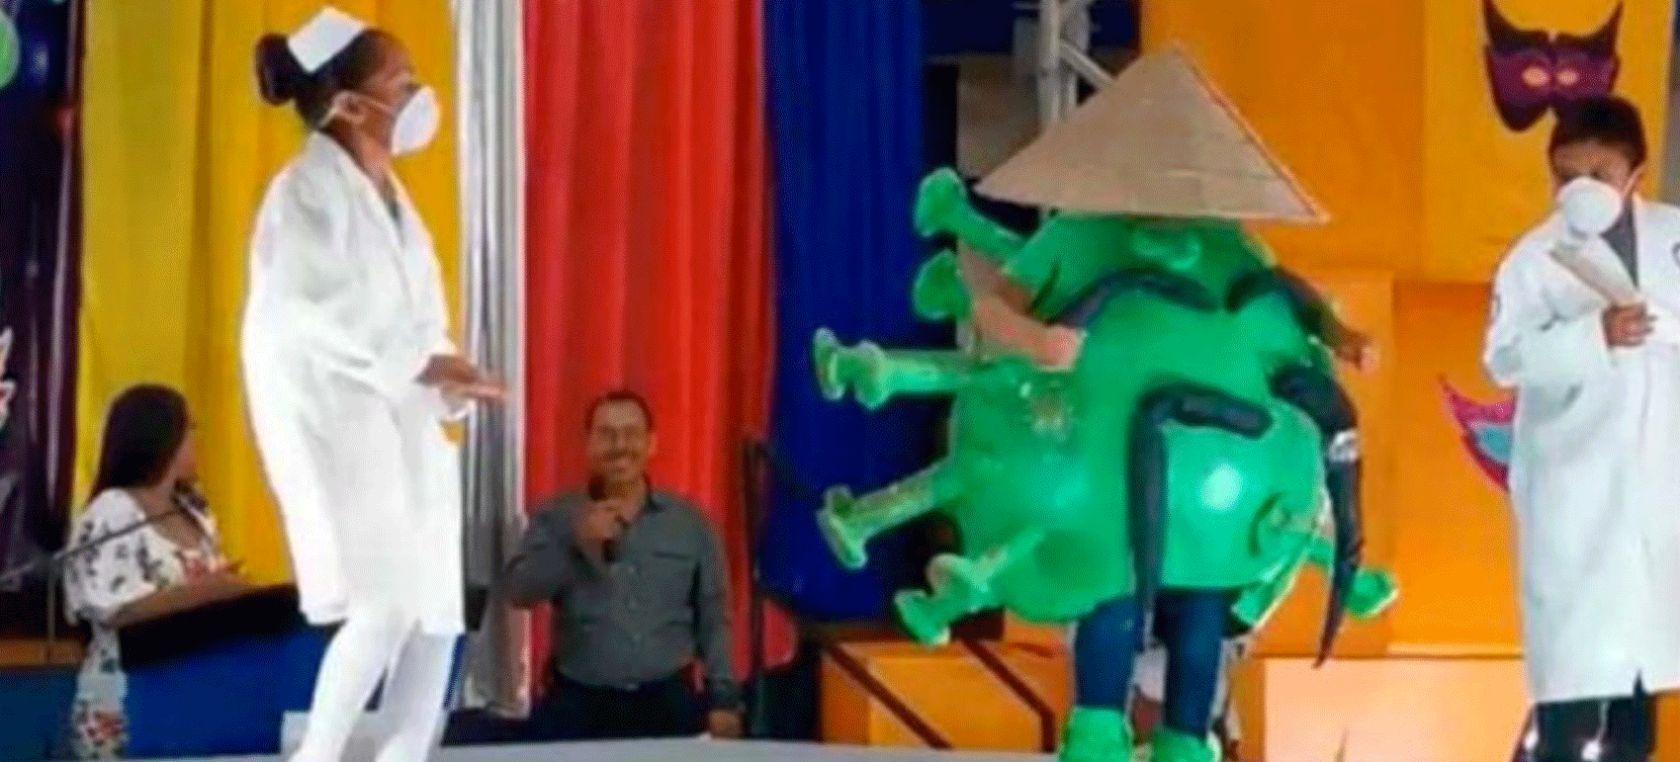 Mi México: Un niño se disfrazó de coronavirus para un carnaval de Tamaulipas